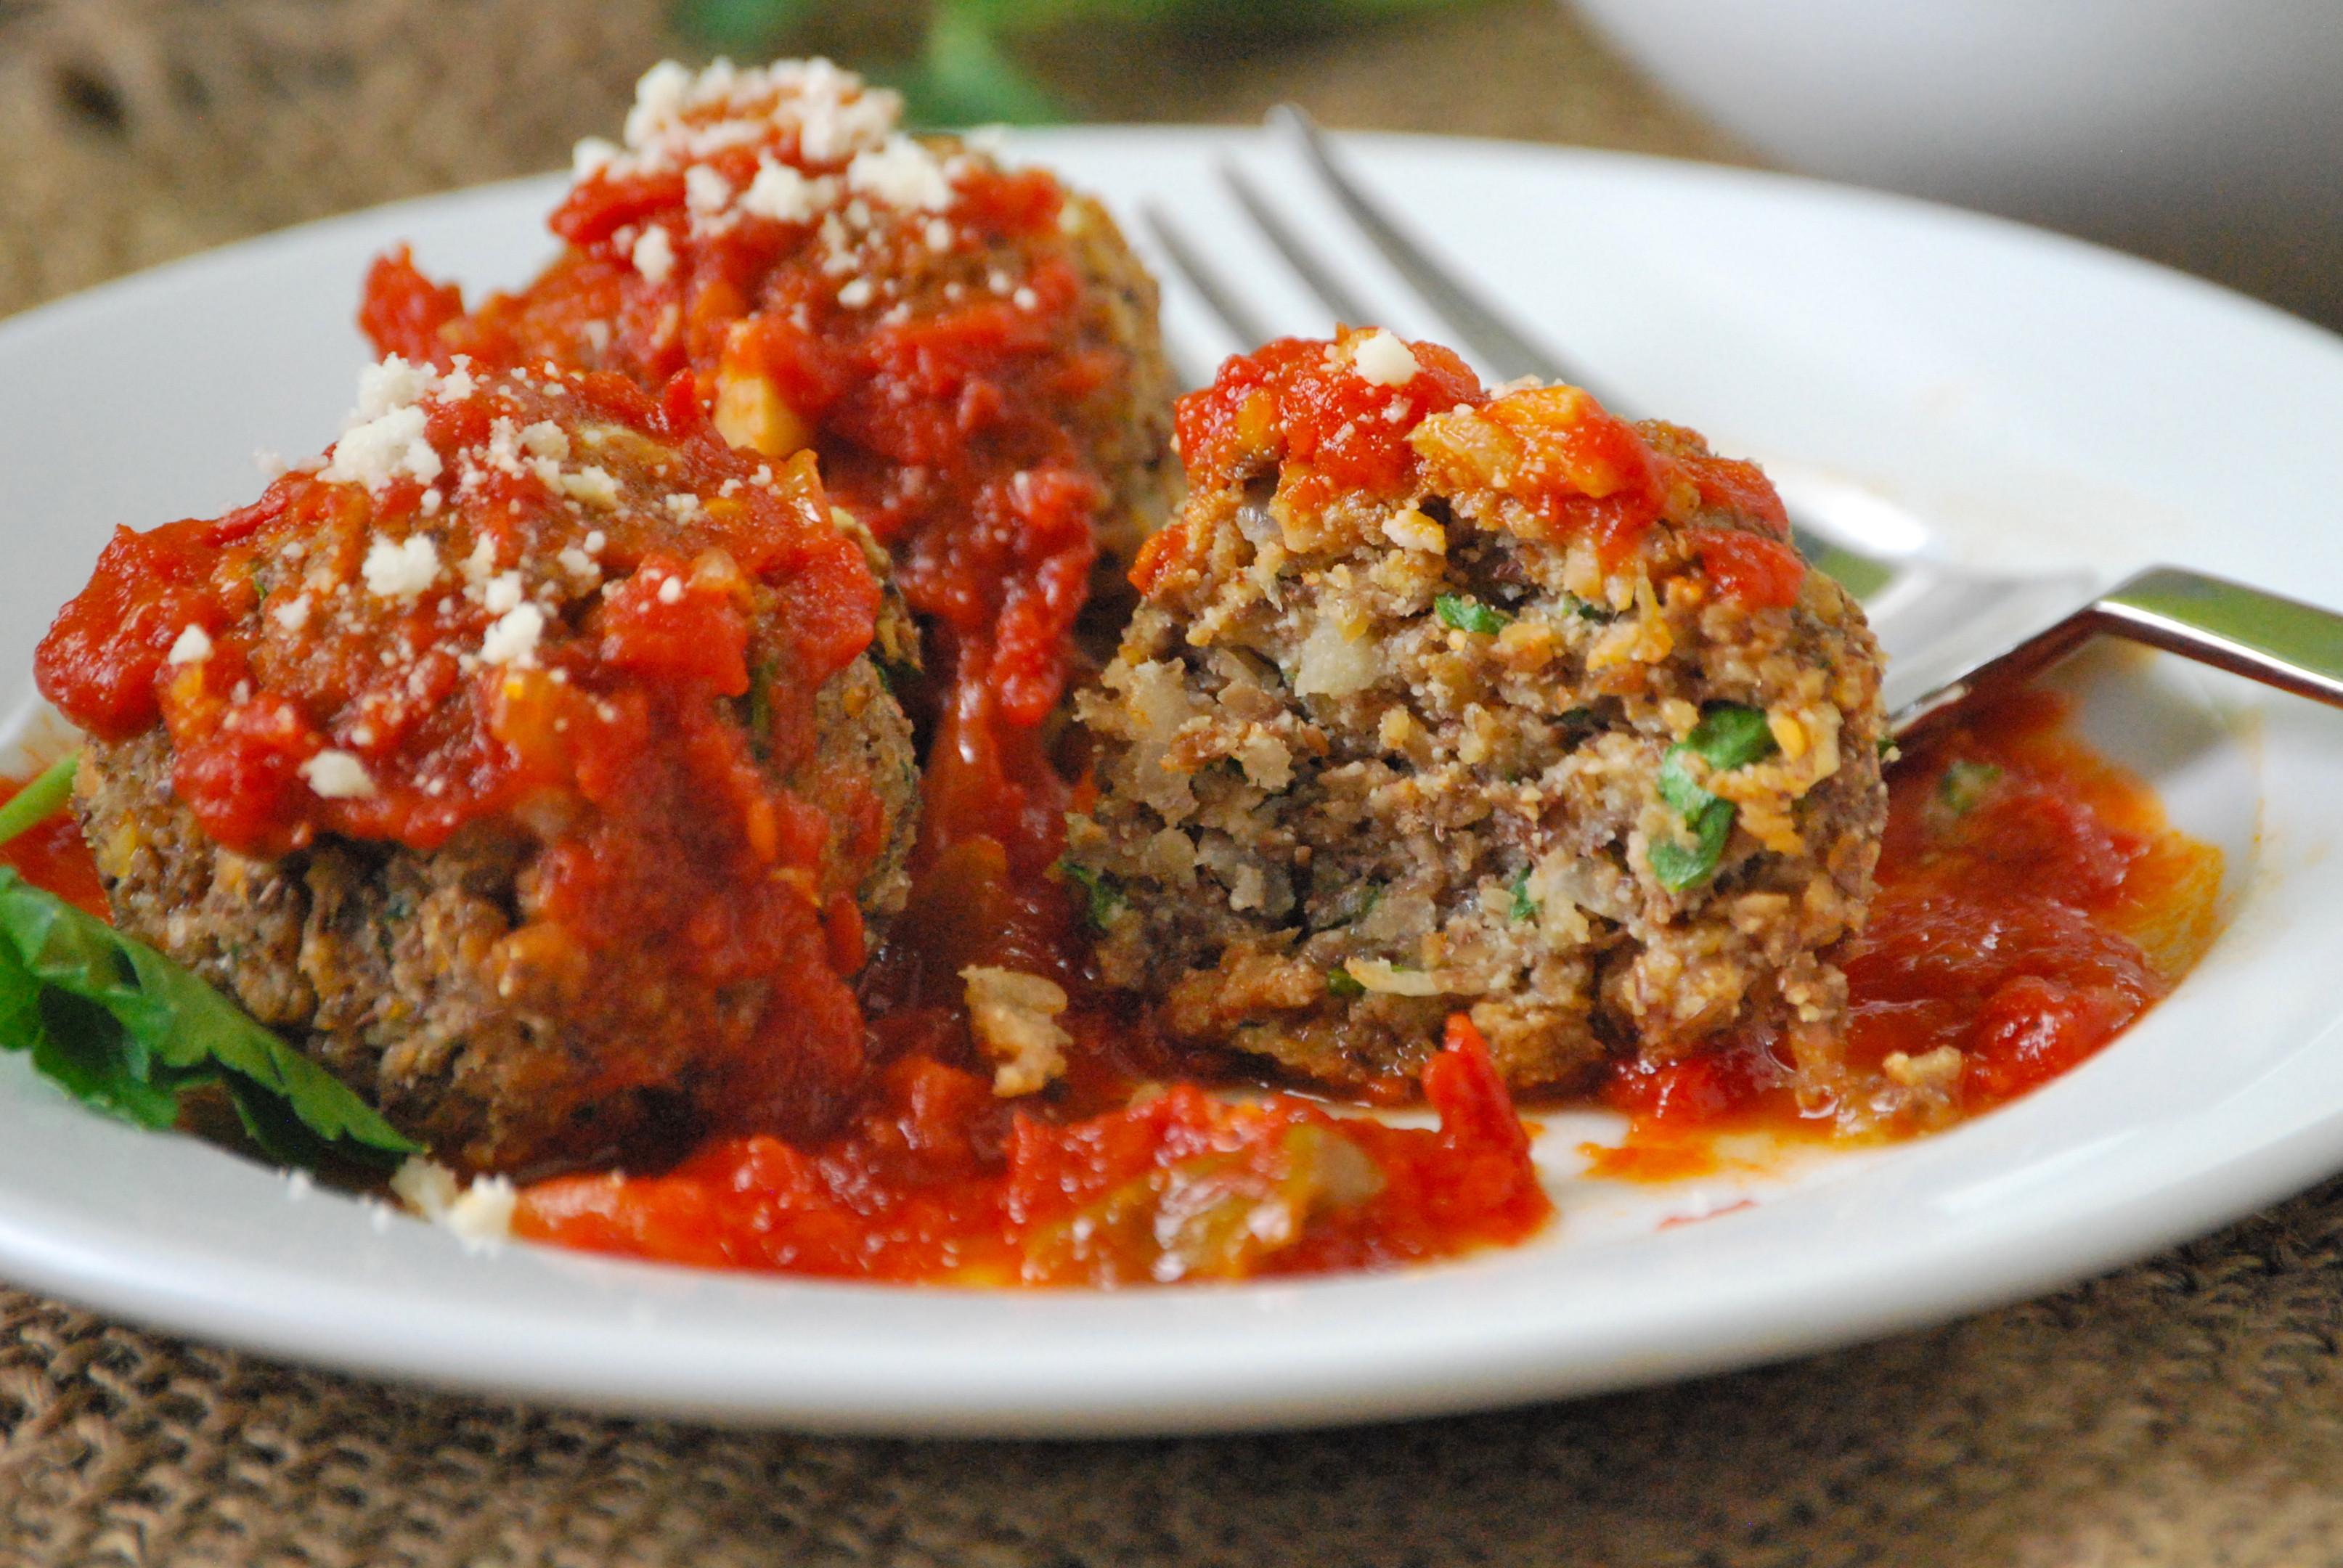 Vegetarian Meatball Recipes  Ve arian Lentil Meatballs